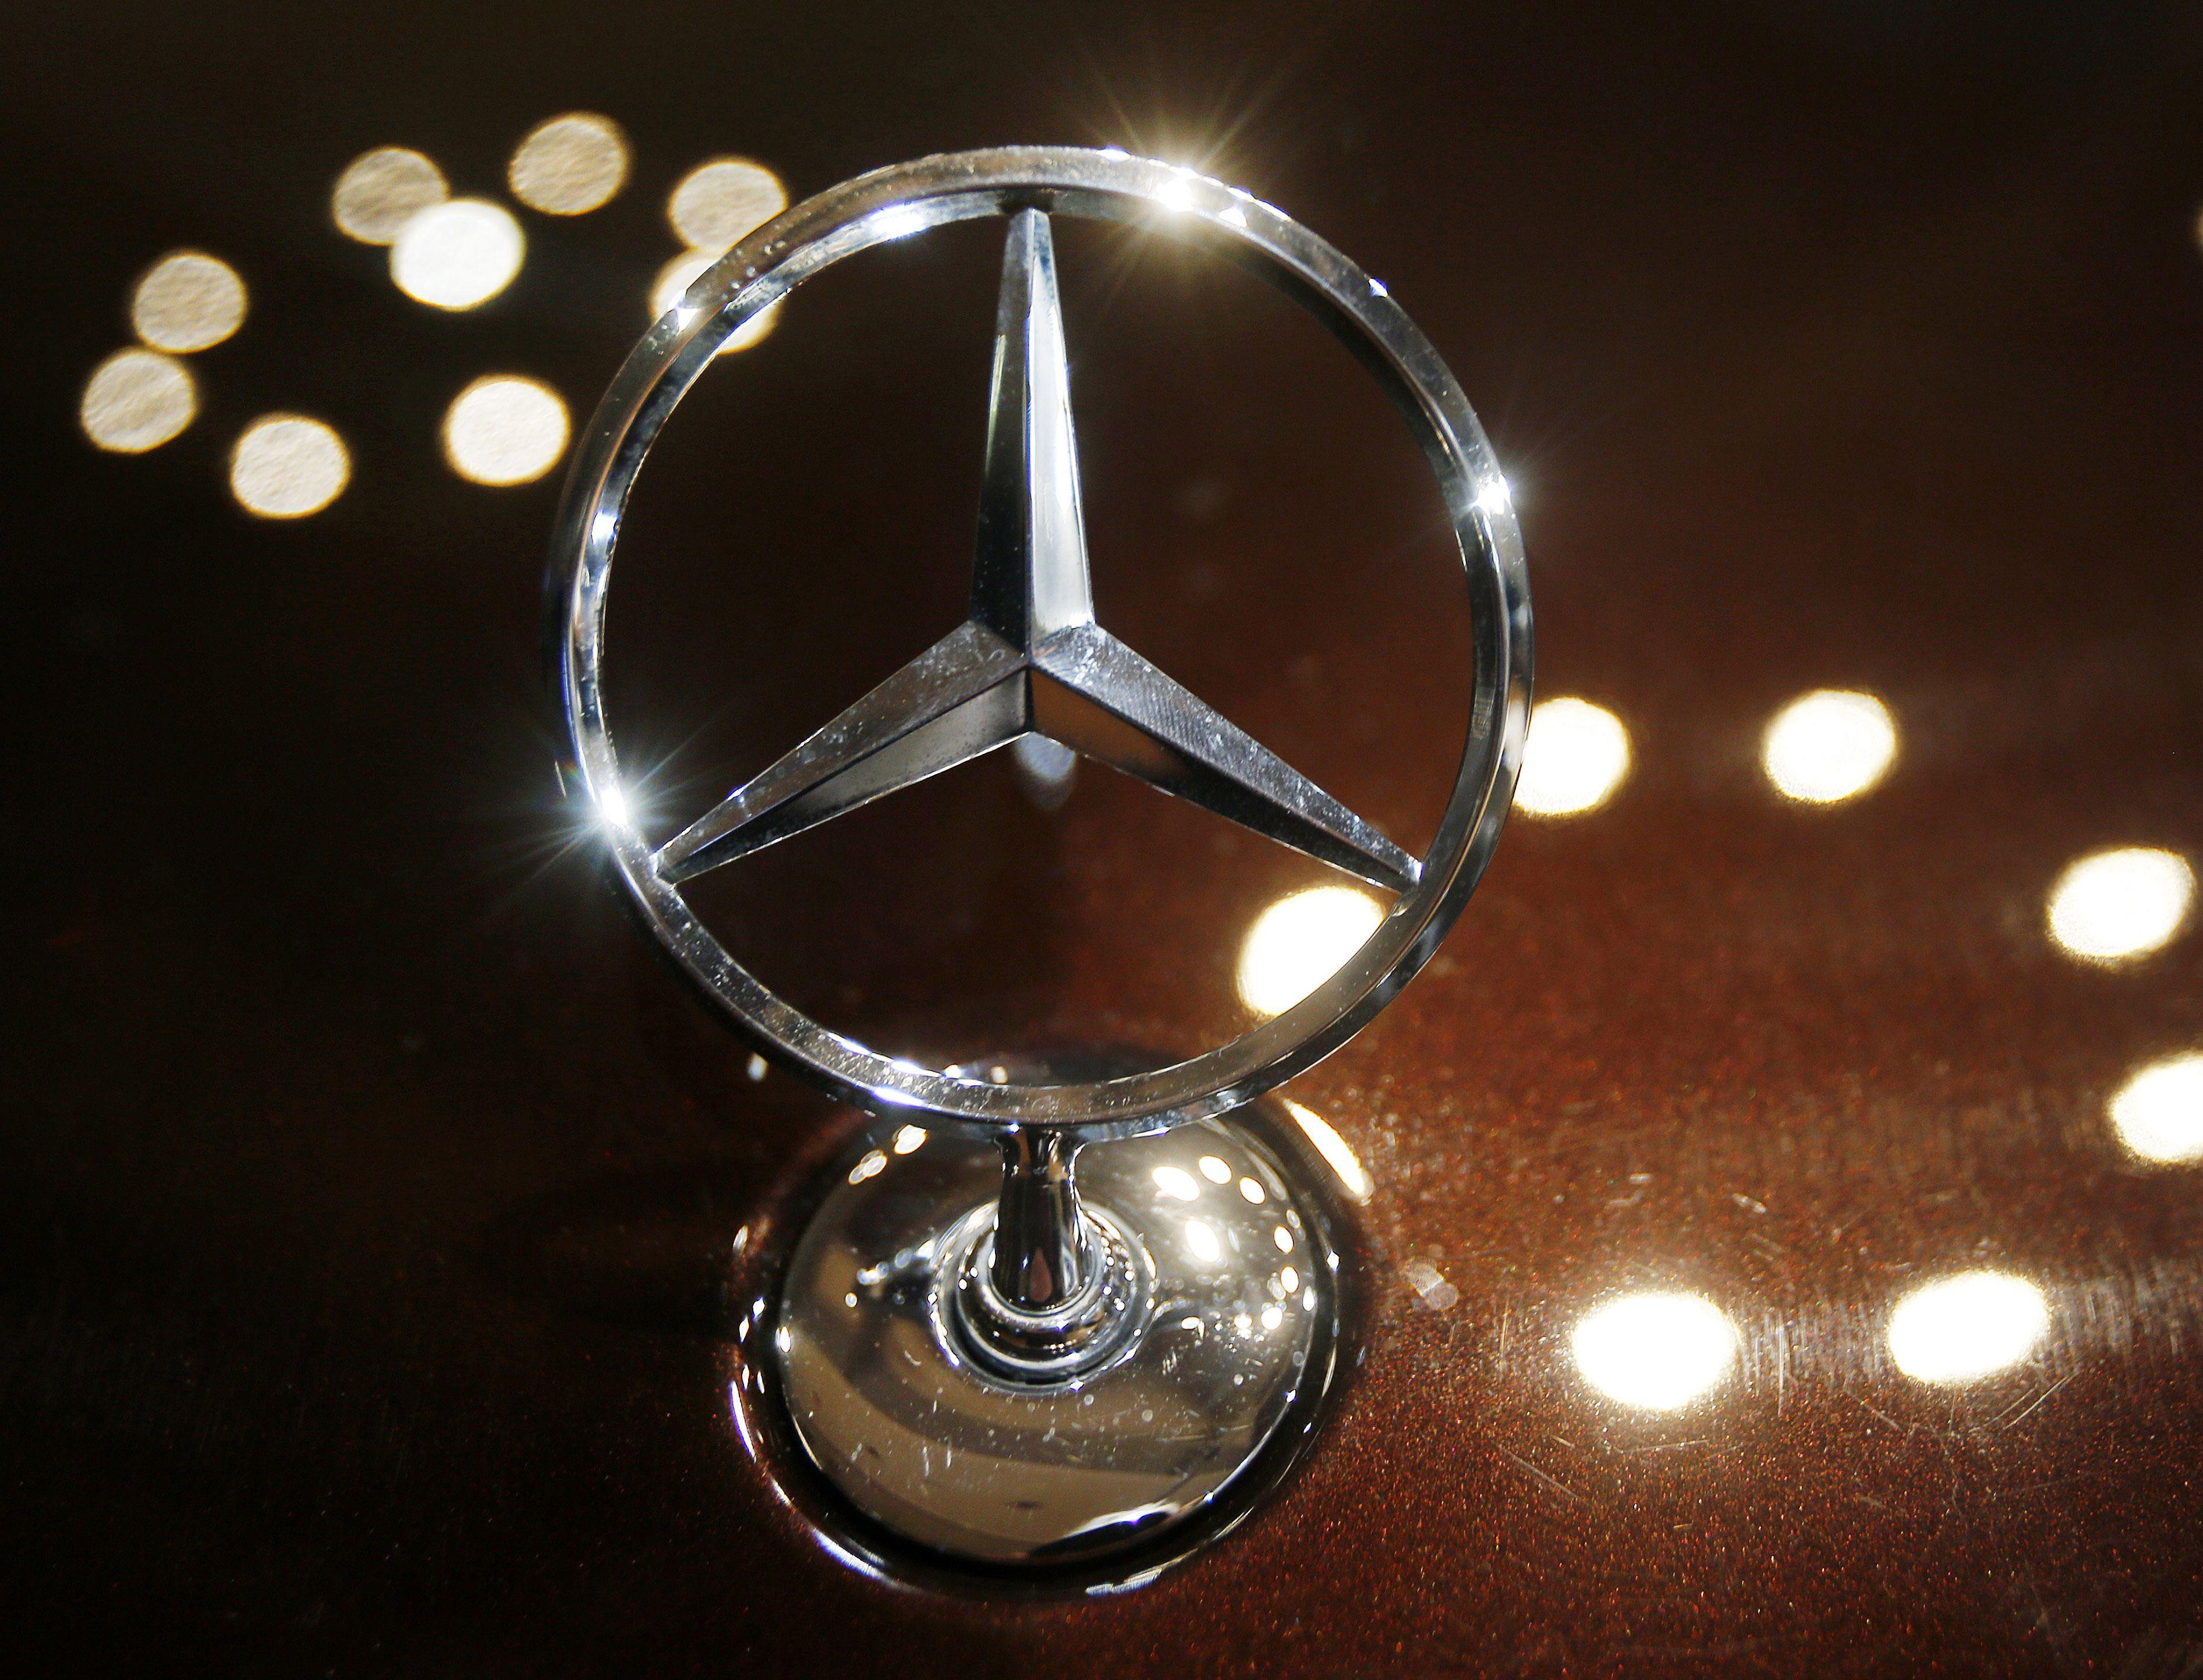 Daimler: $4.3 billion quarterly profit despite chip shortage